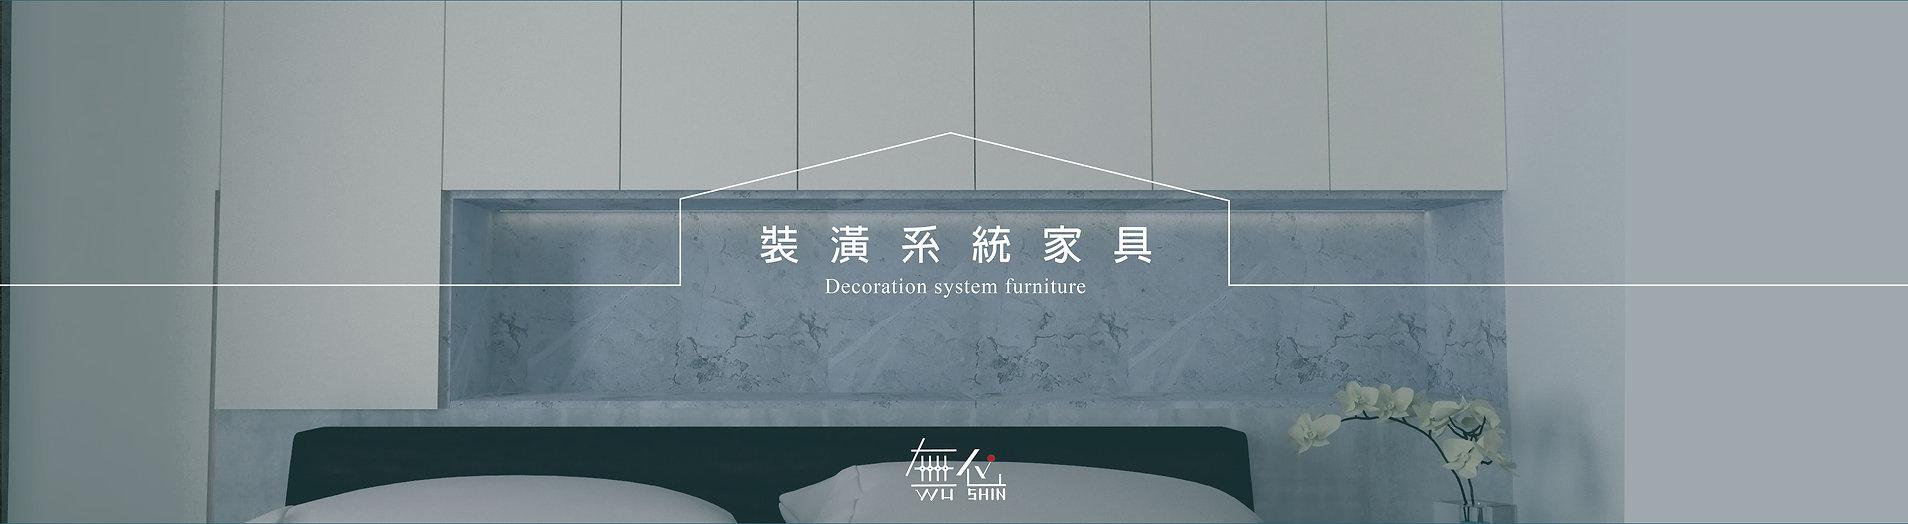 nwe-無心官網banner-05.jpg